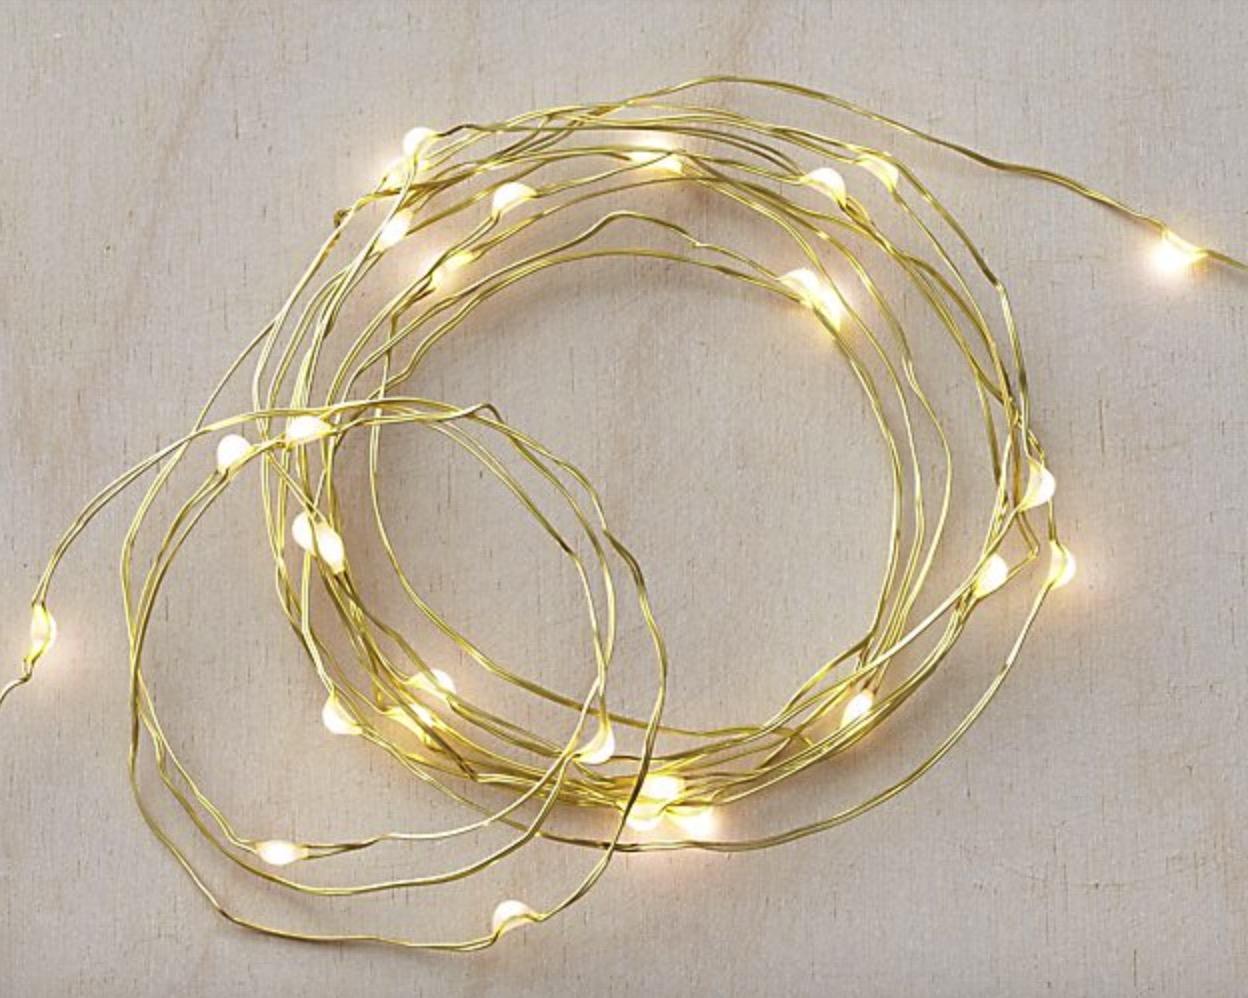 Twinkling Globe String Lights : 14 Party String Lights Ideas - A Sharp Eye